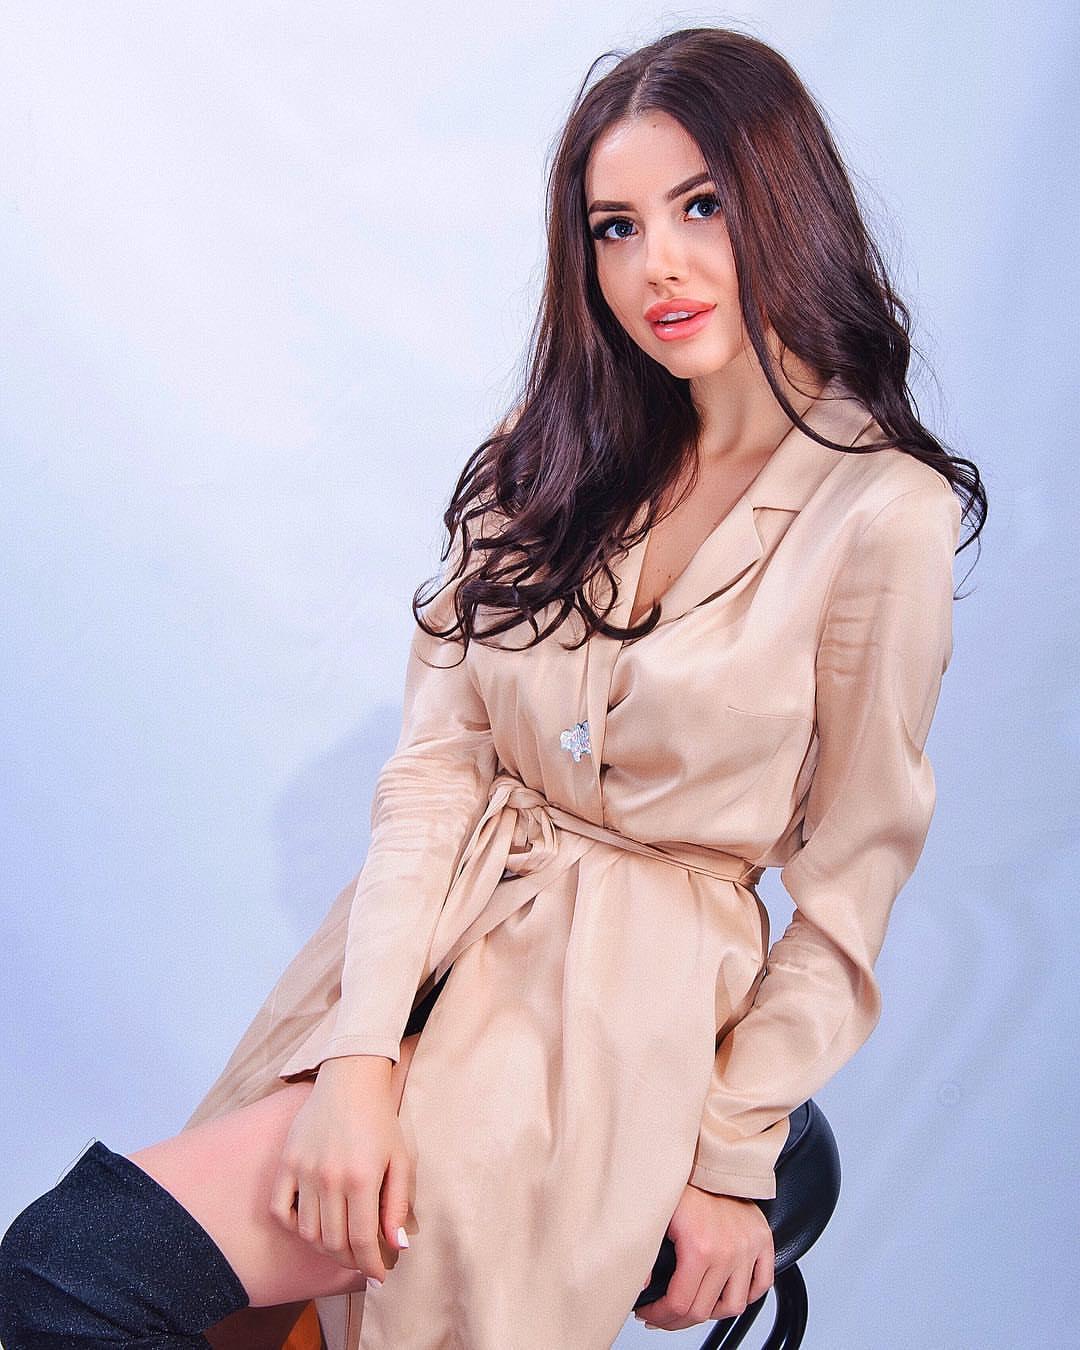 Bachelor Ukraine - Season 10 - Max Mihailuk - Contestants  - *Sleuthing Spoilers* UpTc4P5jGH8